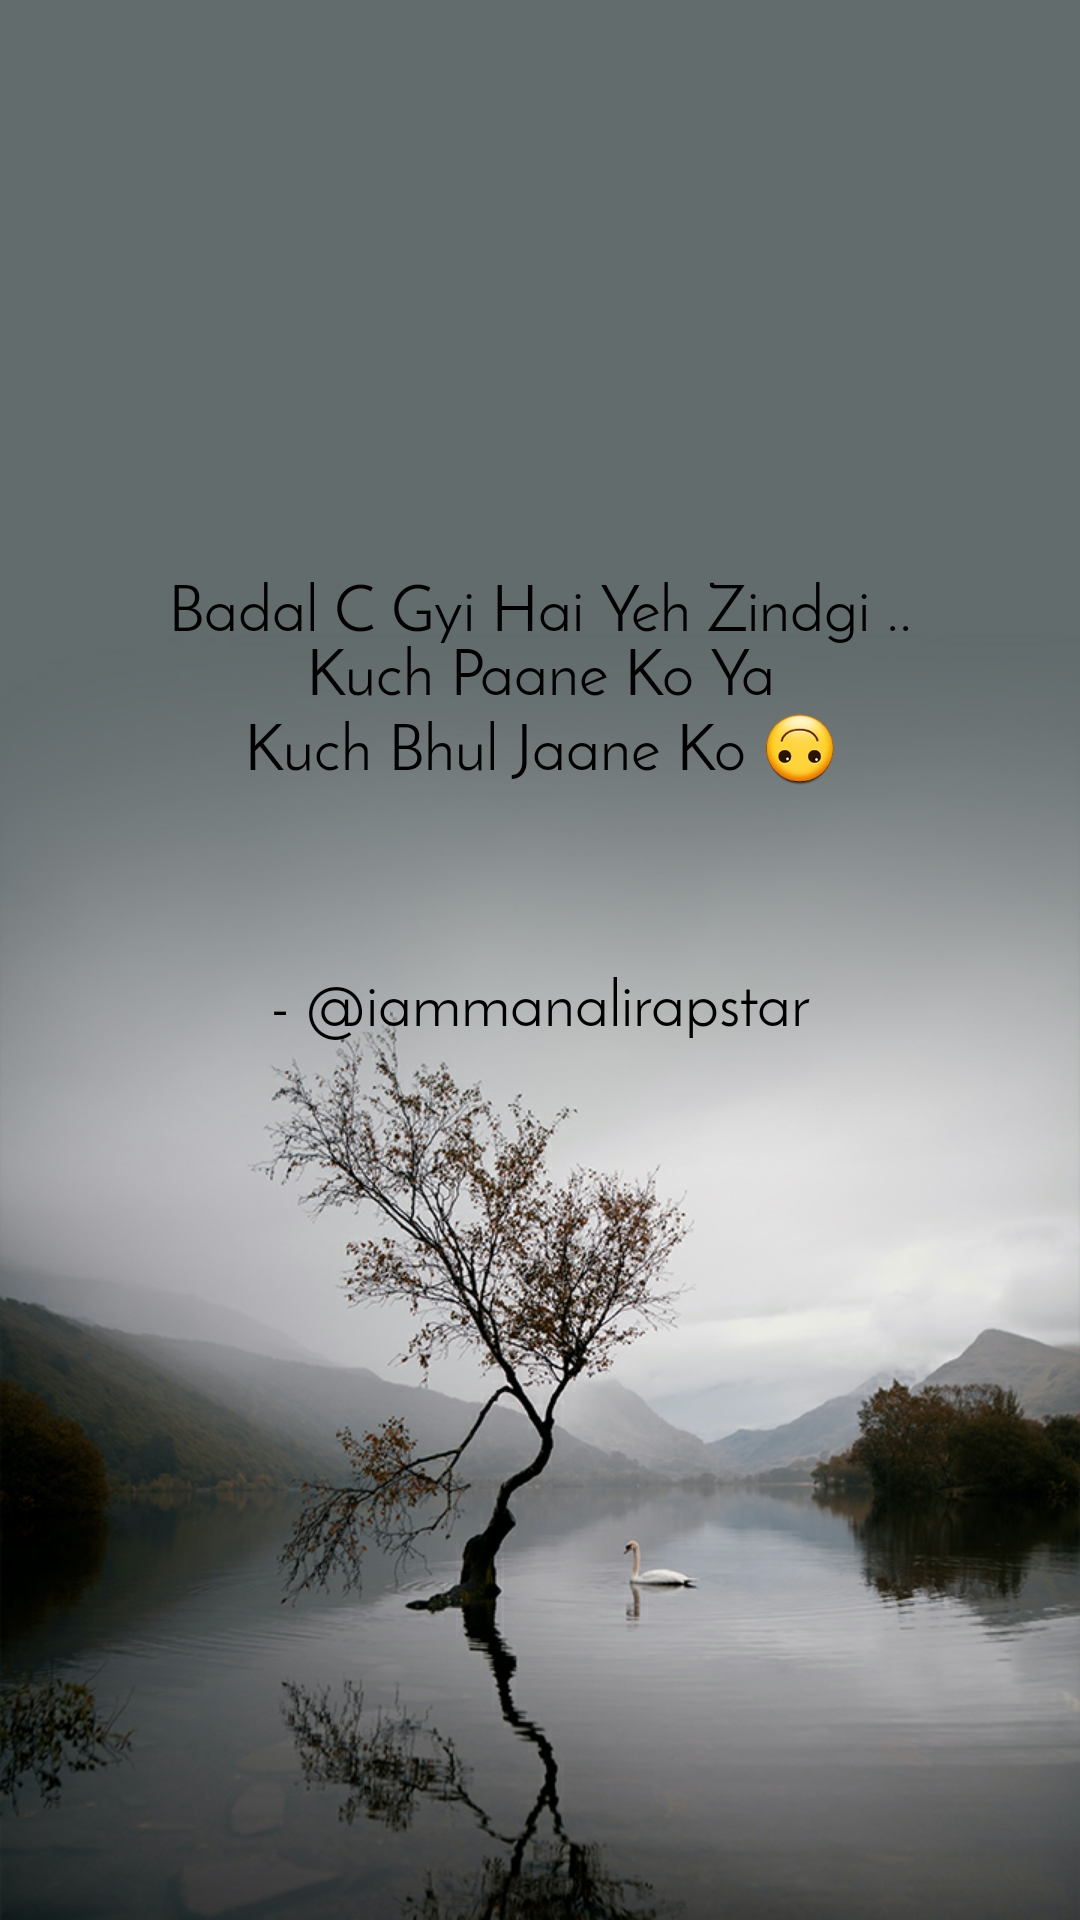 Badal C Gyi Hai Yeh Zindgi .. Kuch Paane Ko Ya Kuch Bhul Jaane Ko 🙃    - @iammanalirapstar